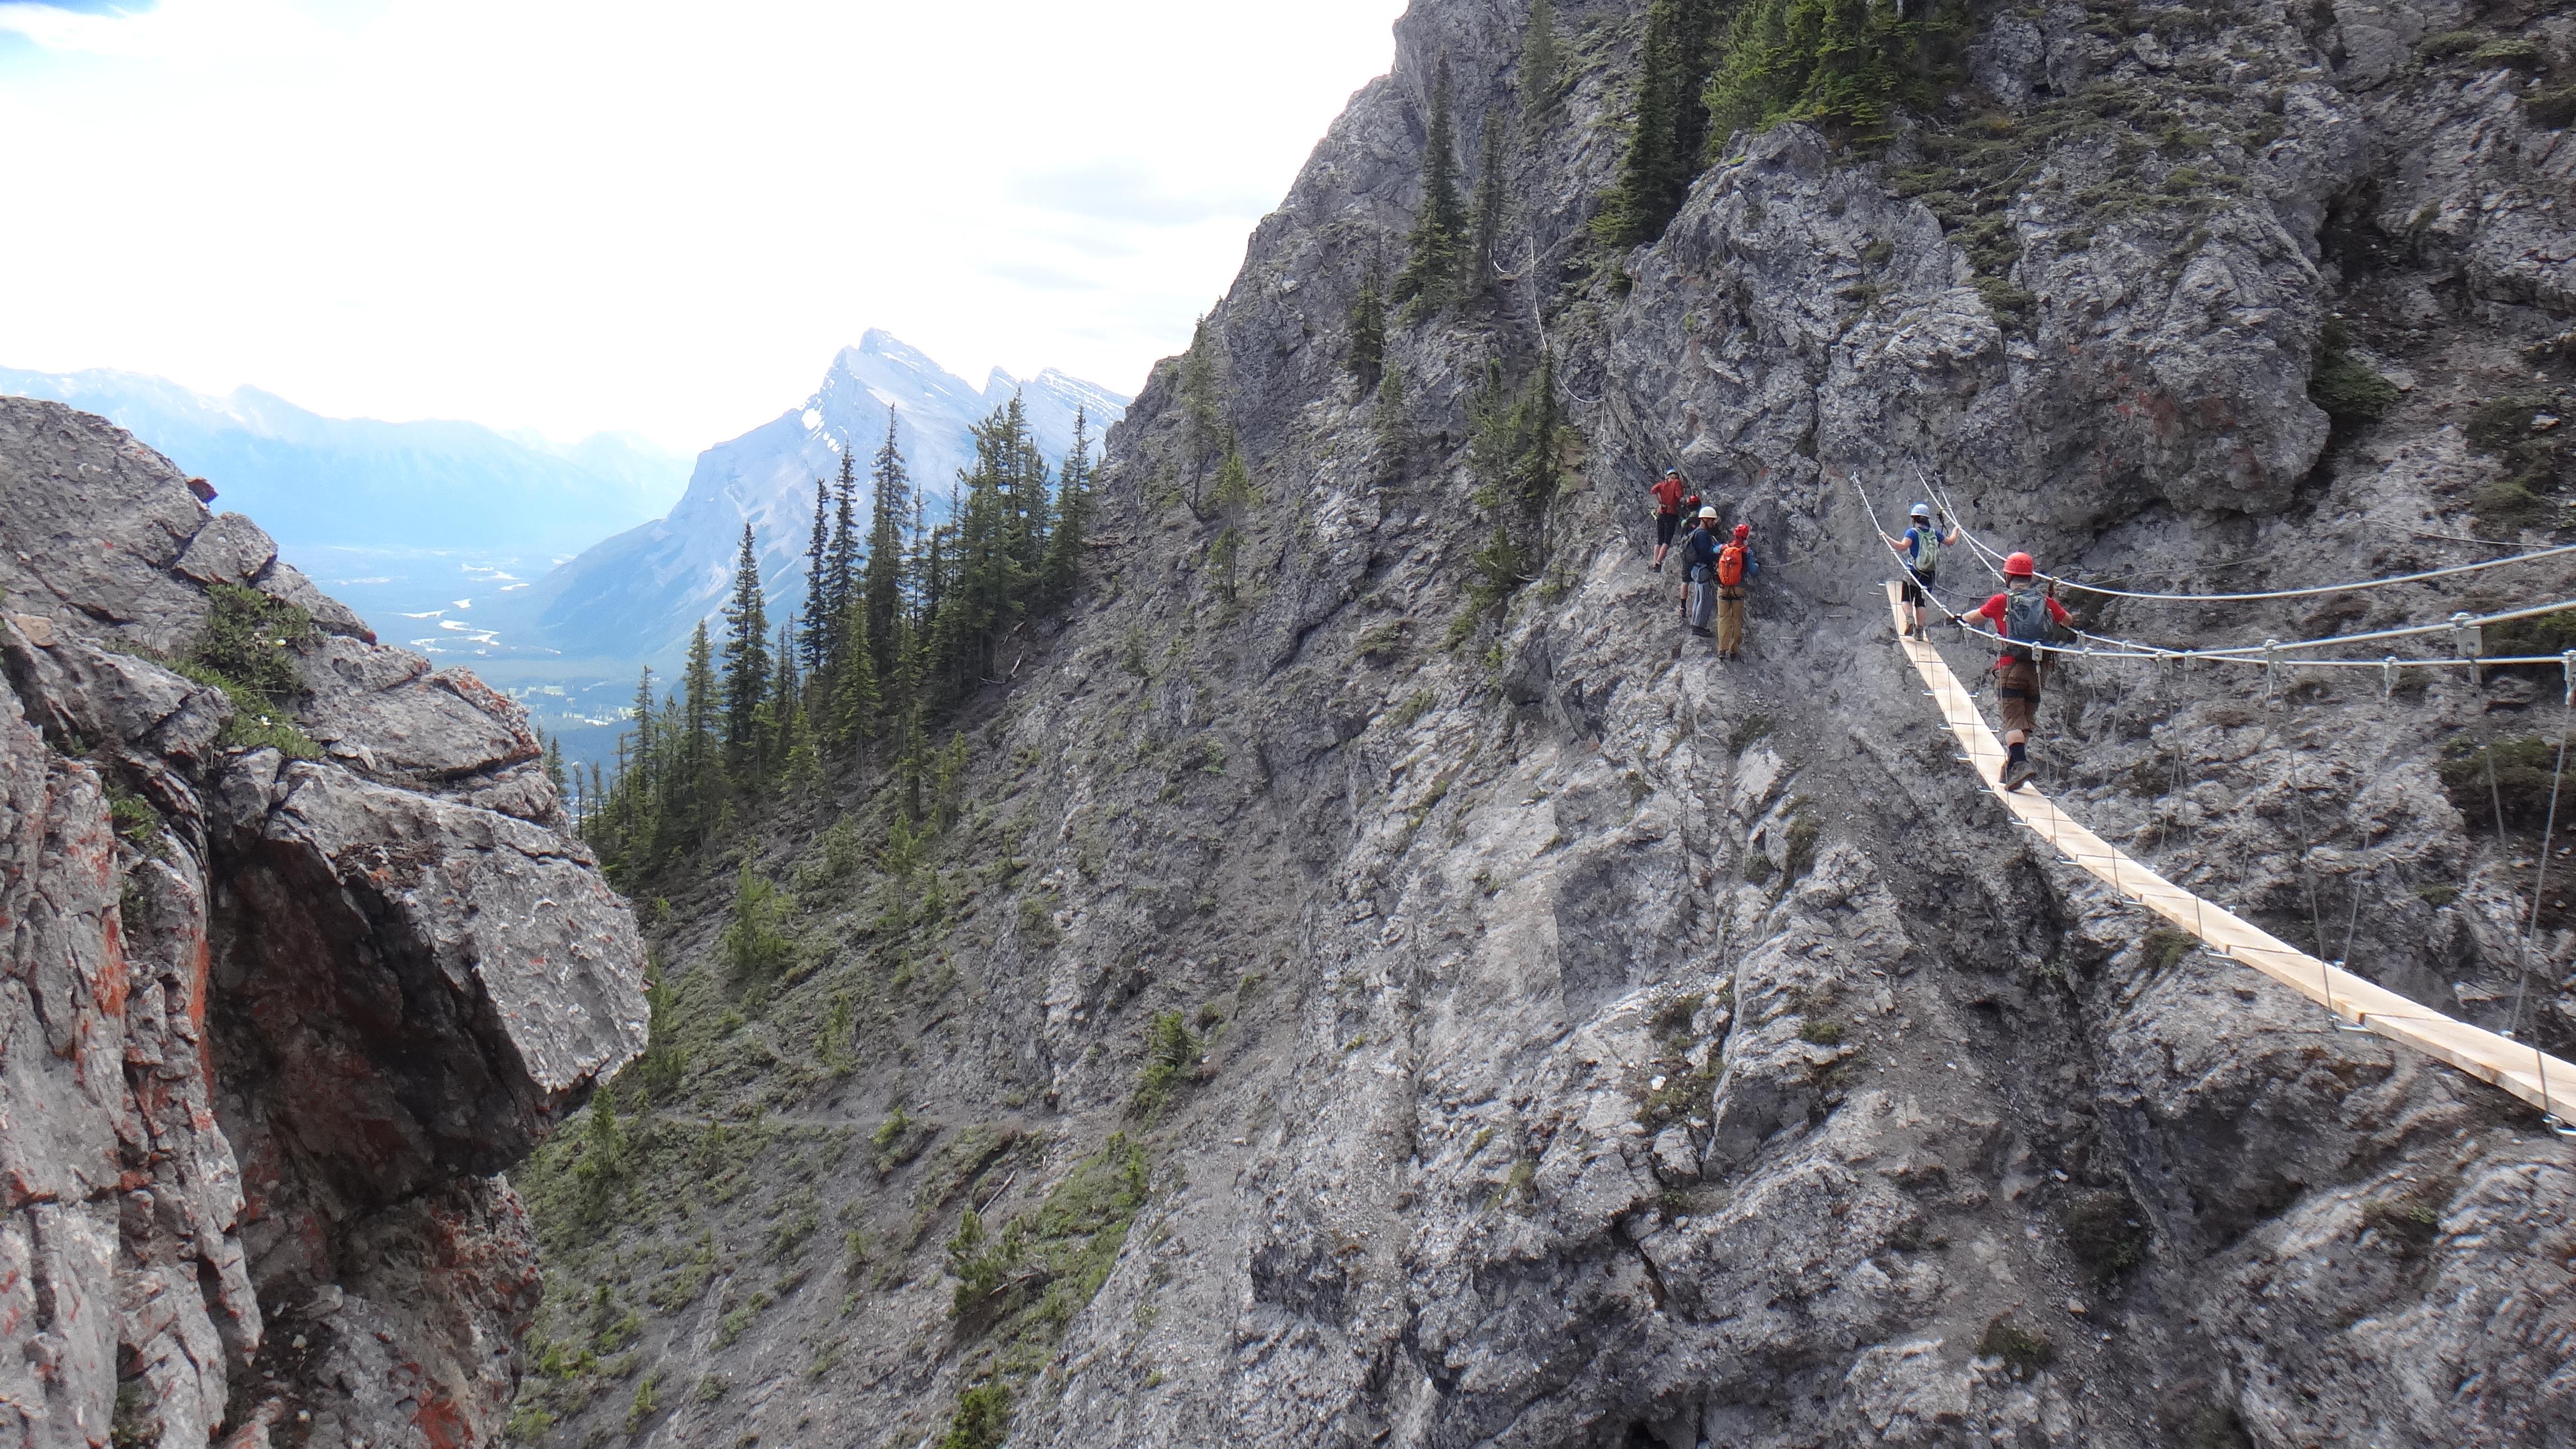 Banff Norquay Via Ferrata Random Eating Adventures